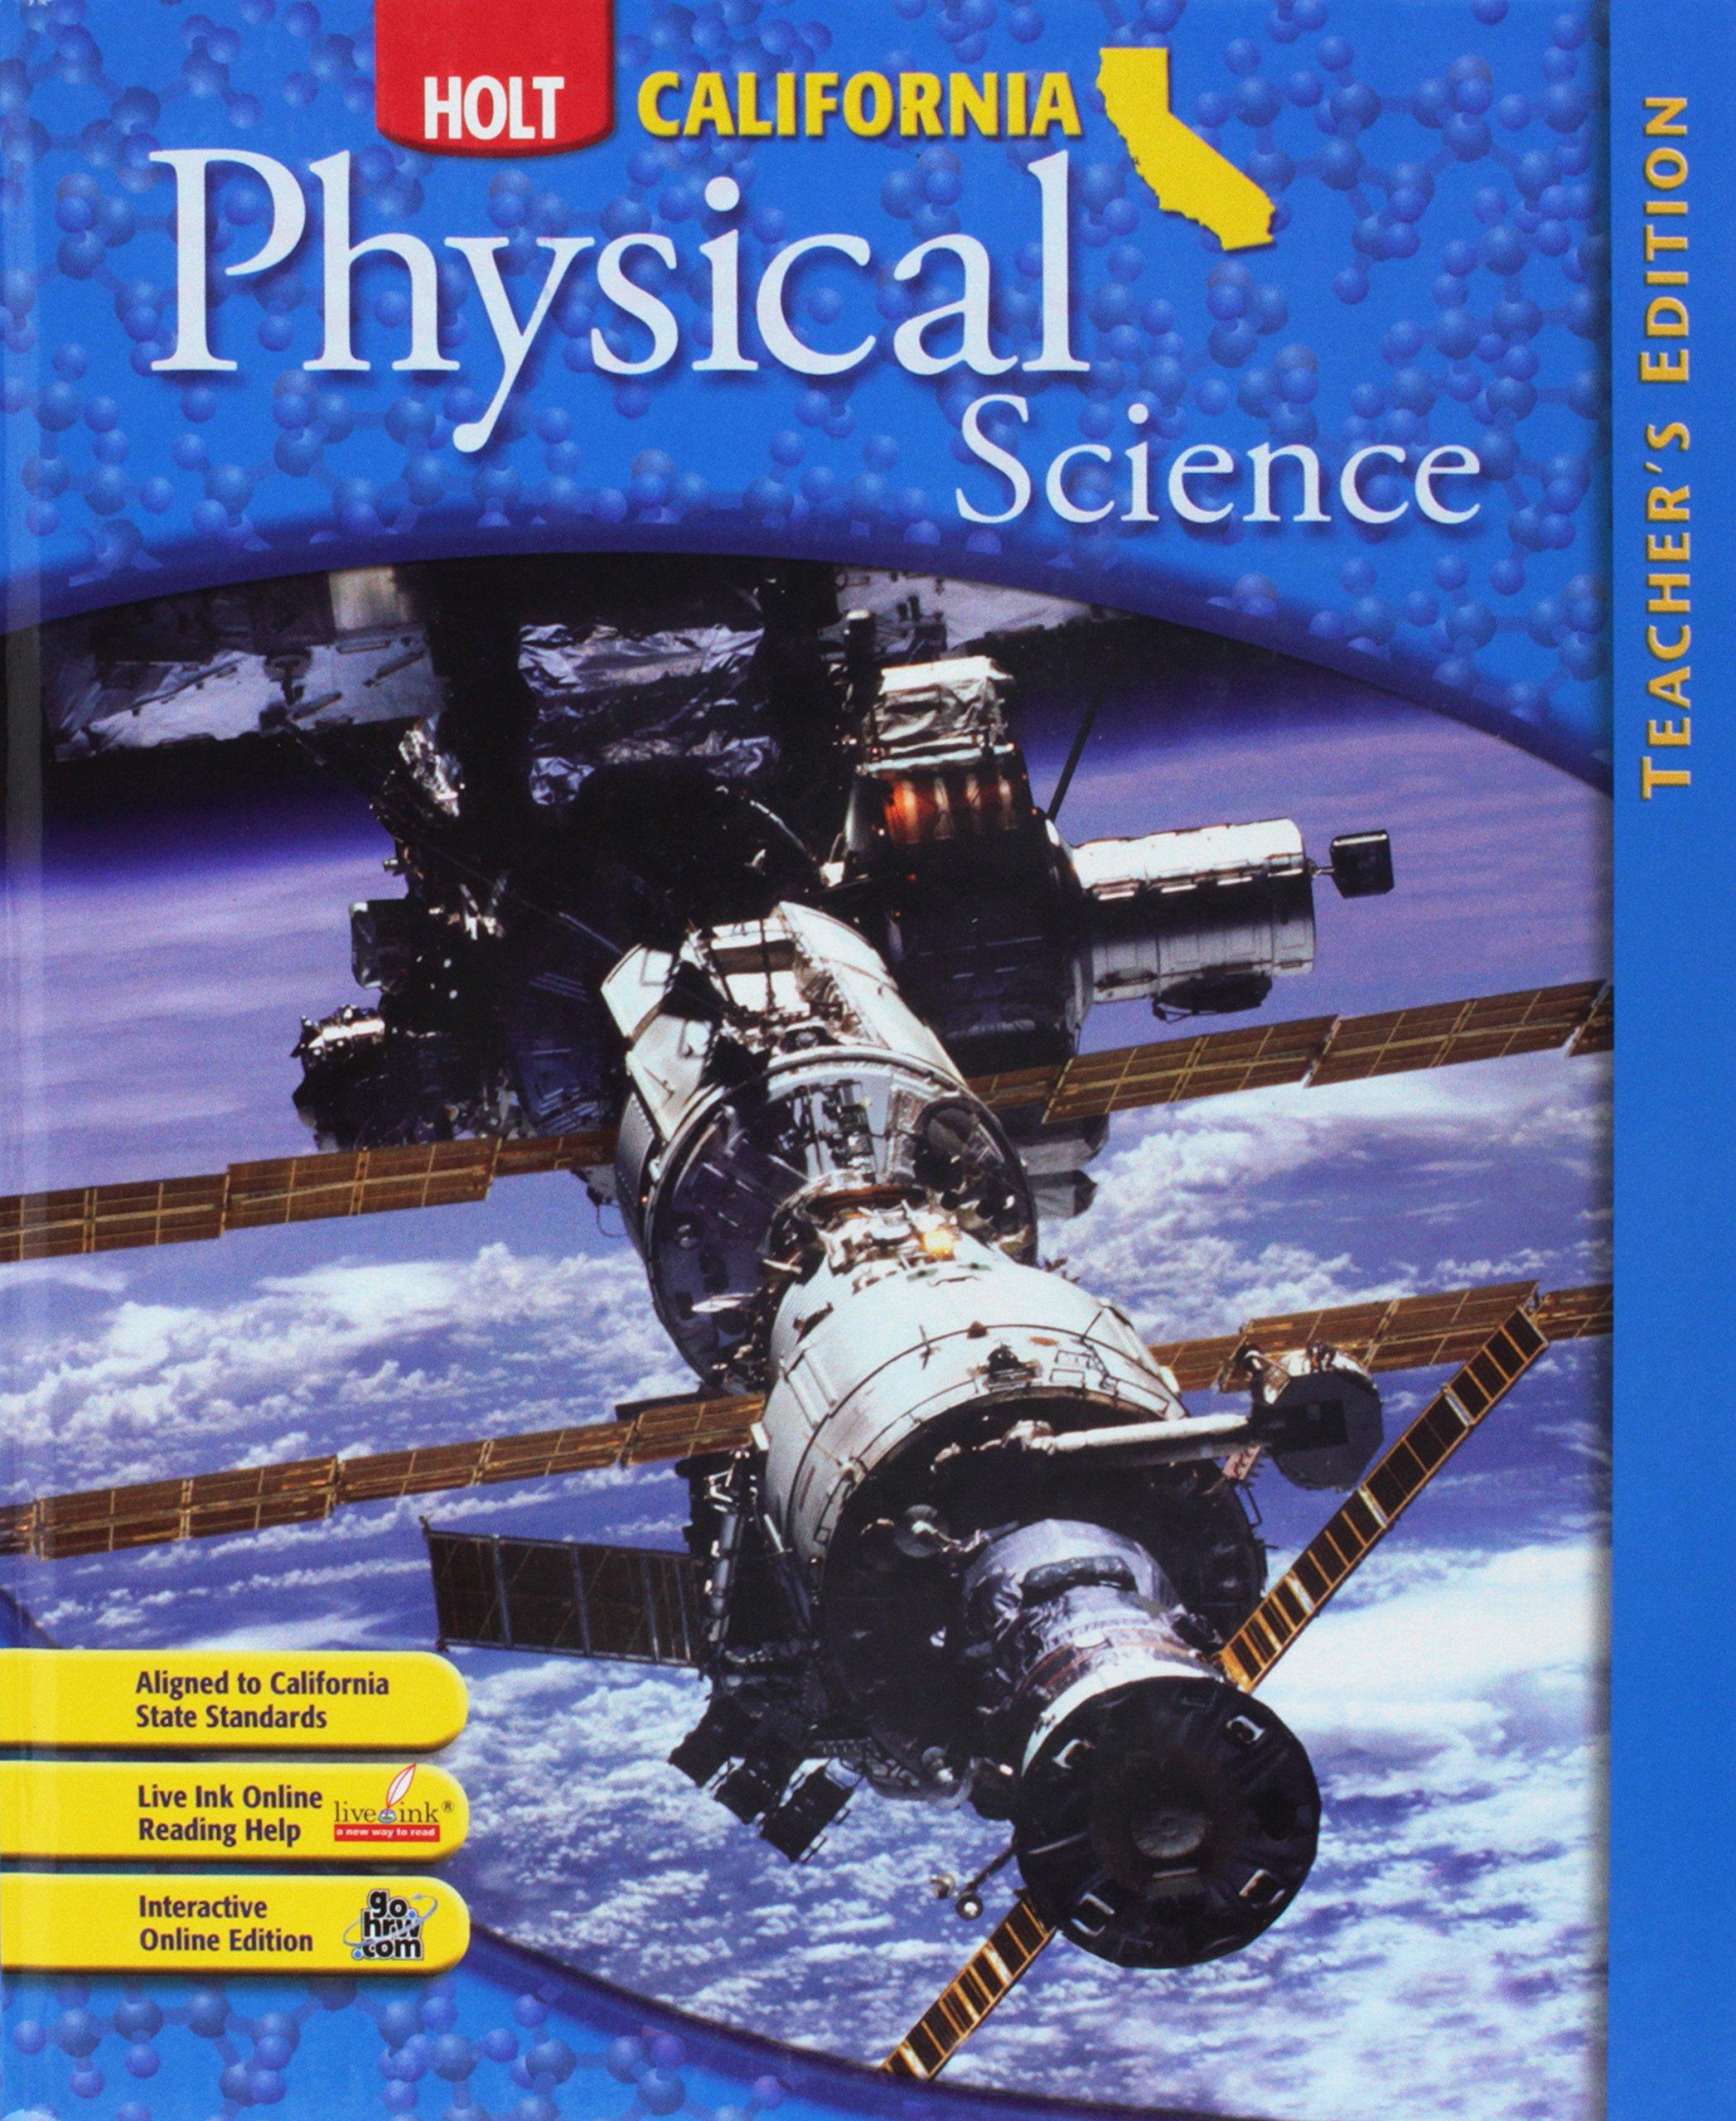 holt california physical science christie borgford 9780030464638 rh amazon com California Holt Science Books Holt California Physical Science Edition